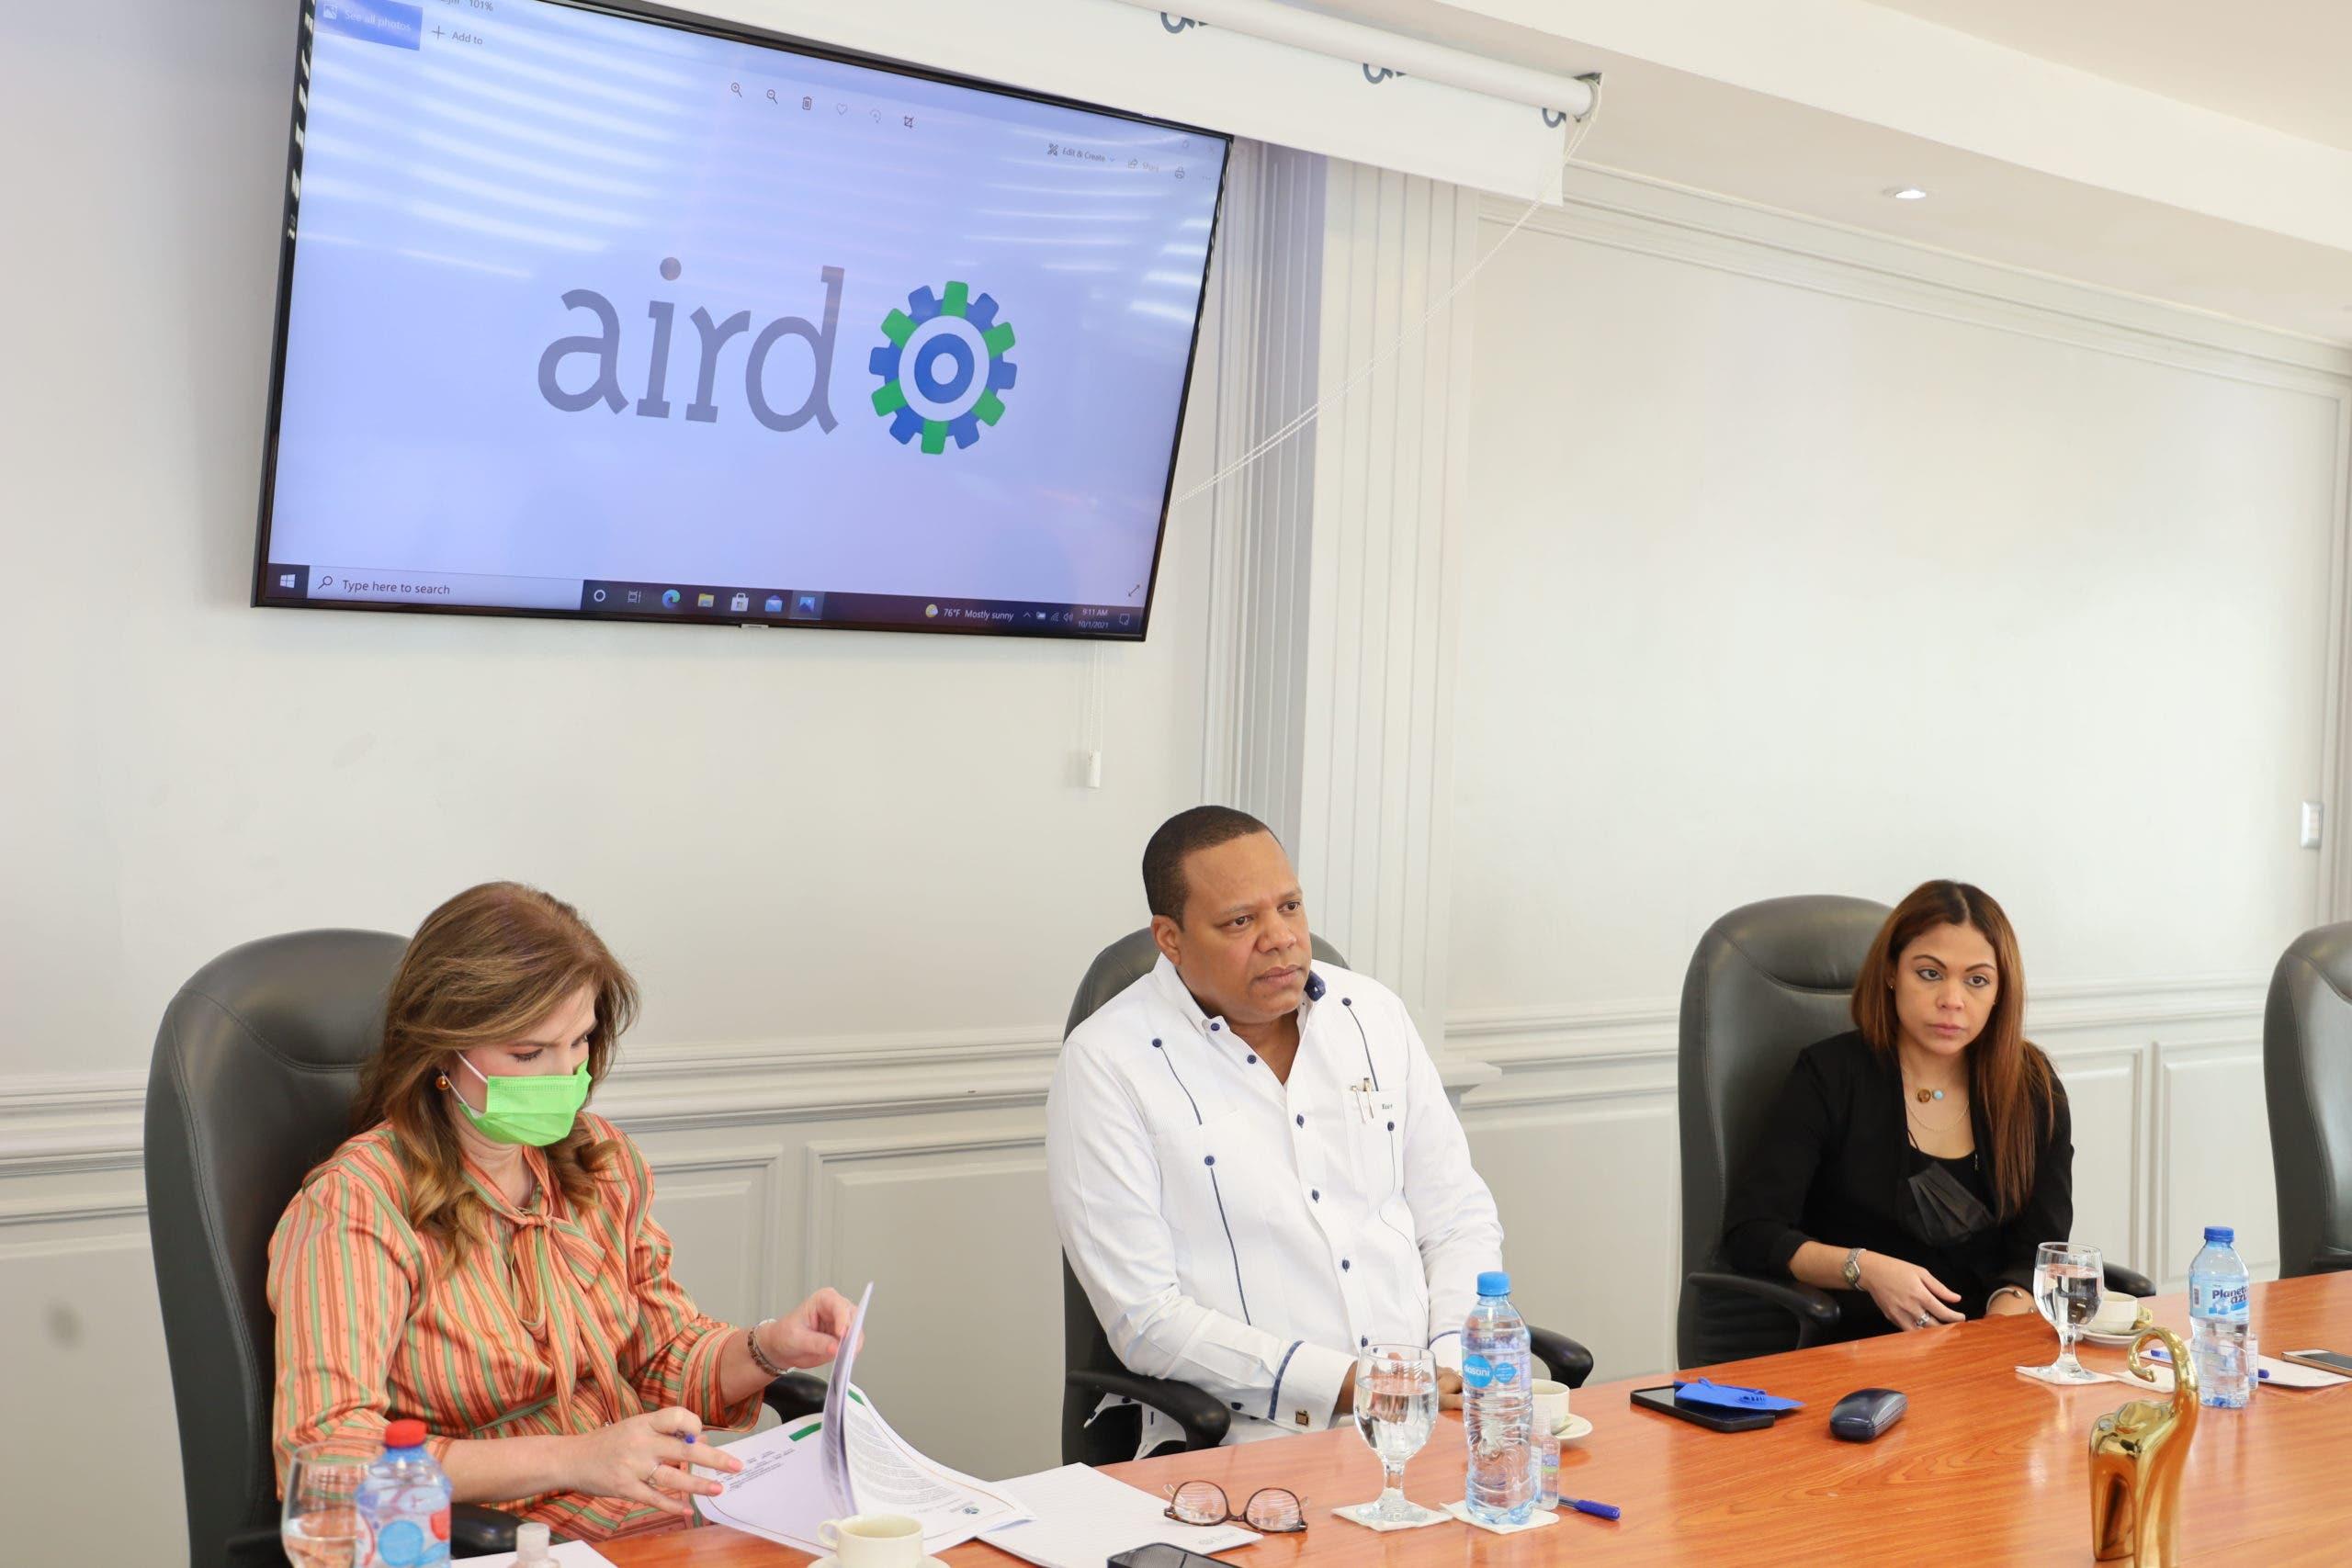 Pro Consumidor e industriales aclaran alcance resolución restringe venta destapadores de tuberías